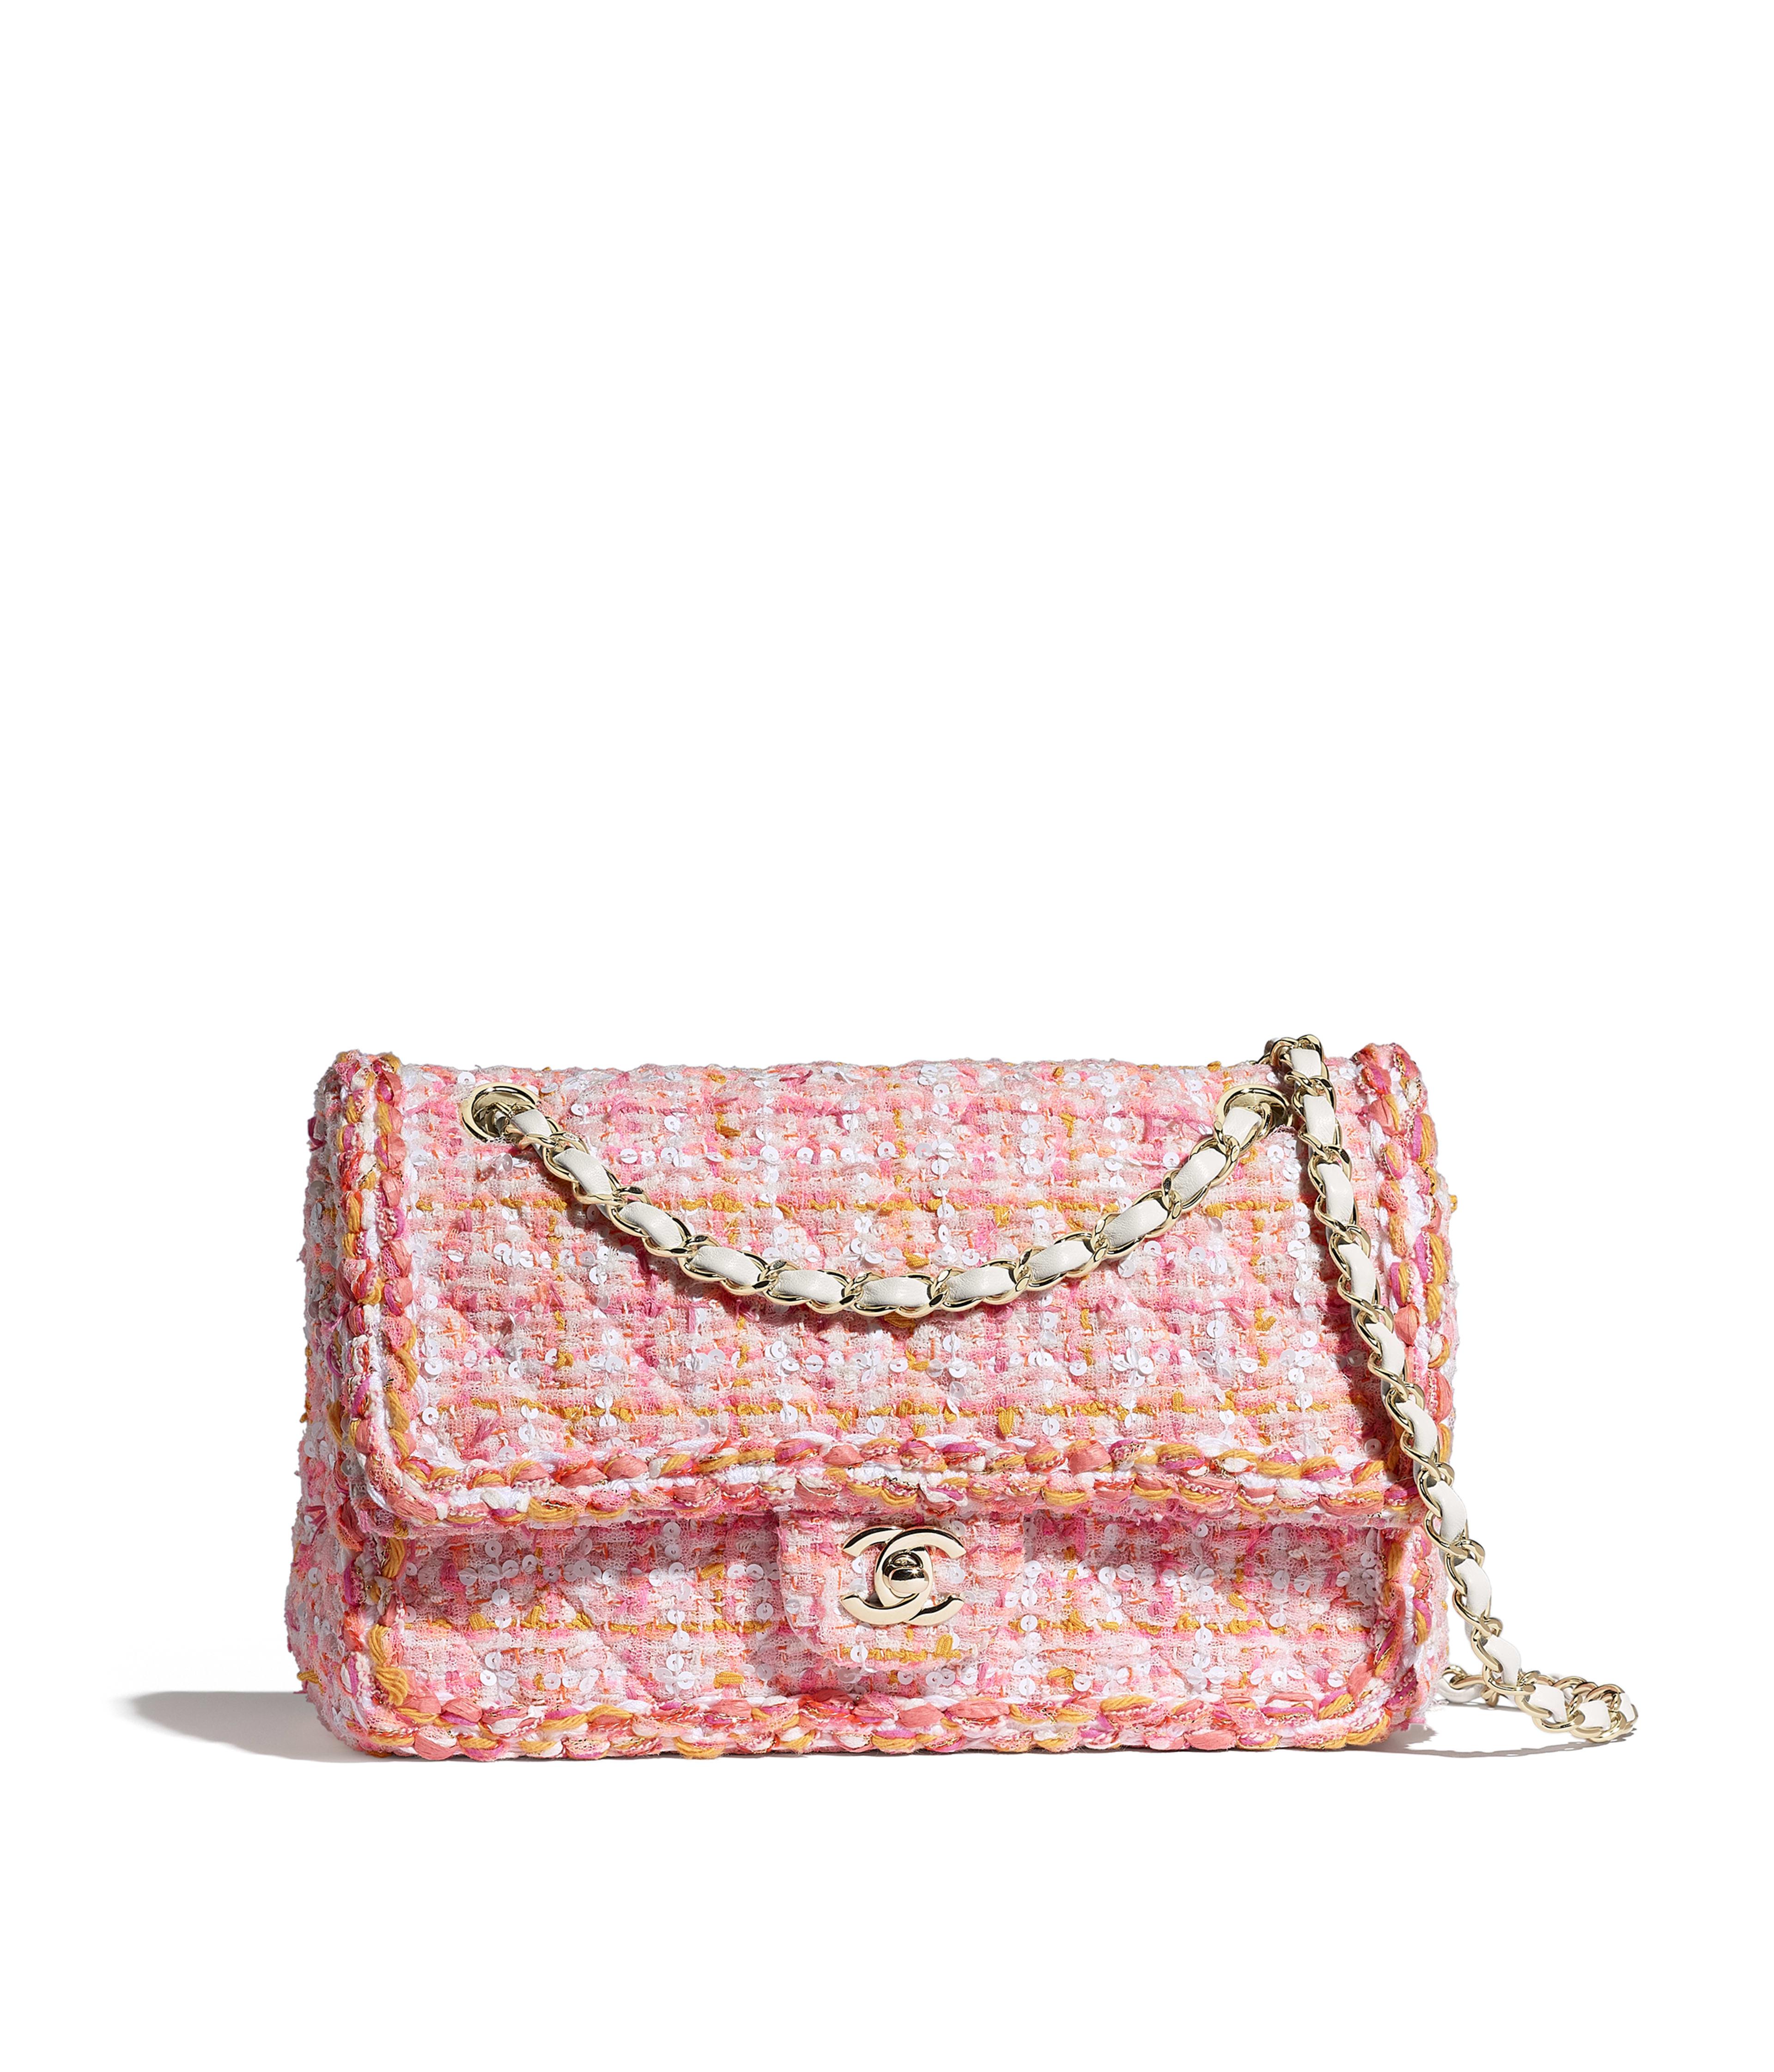 0d132fd679e8 Classic Handbag Tweed, Braid & Gold-Tone Metal, Pink, White, Yellow &  Orange Ref. A01112Y84068MF541